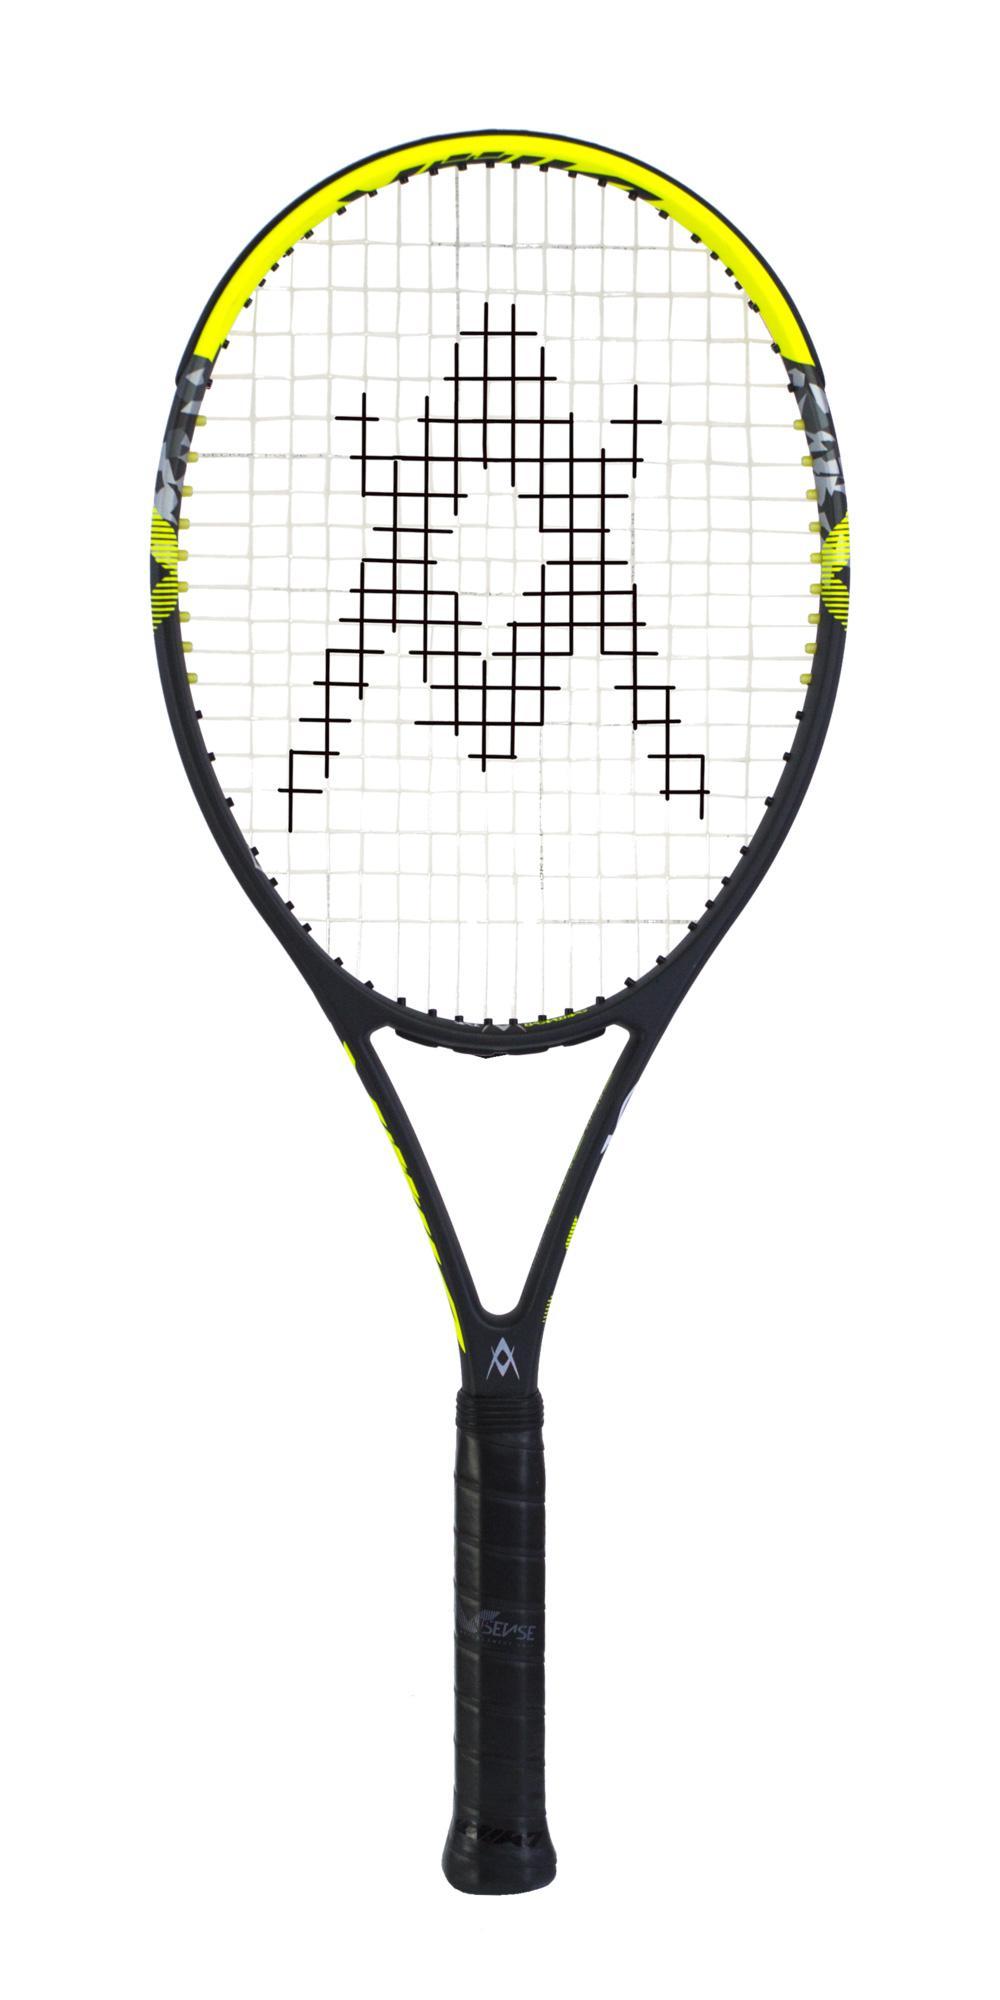 volkl v-sense 10 325g tennis racket